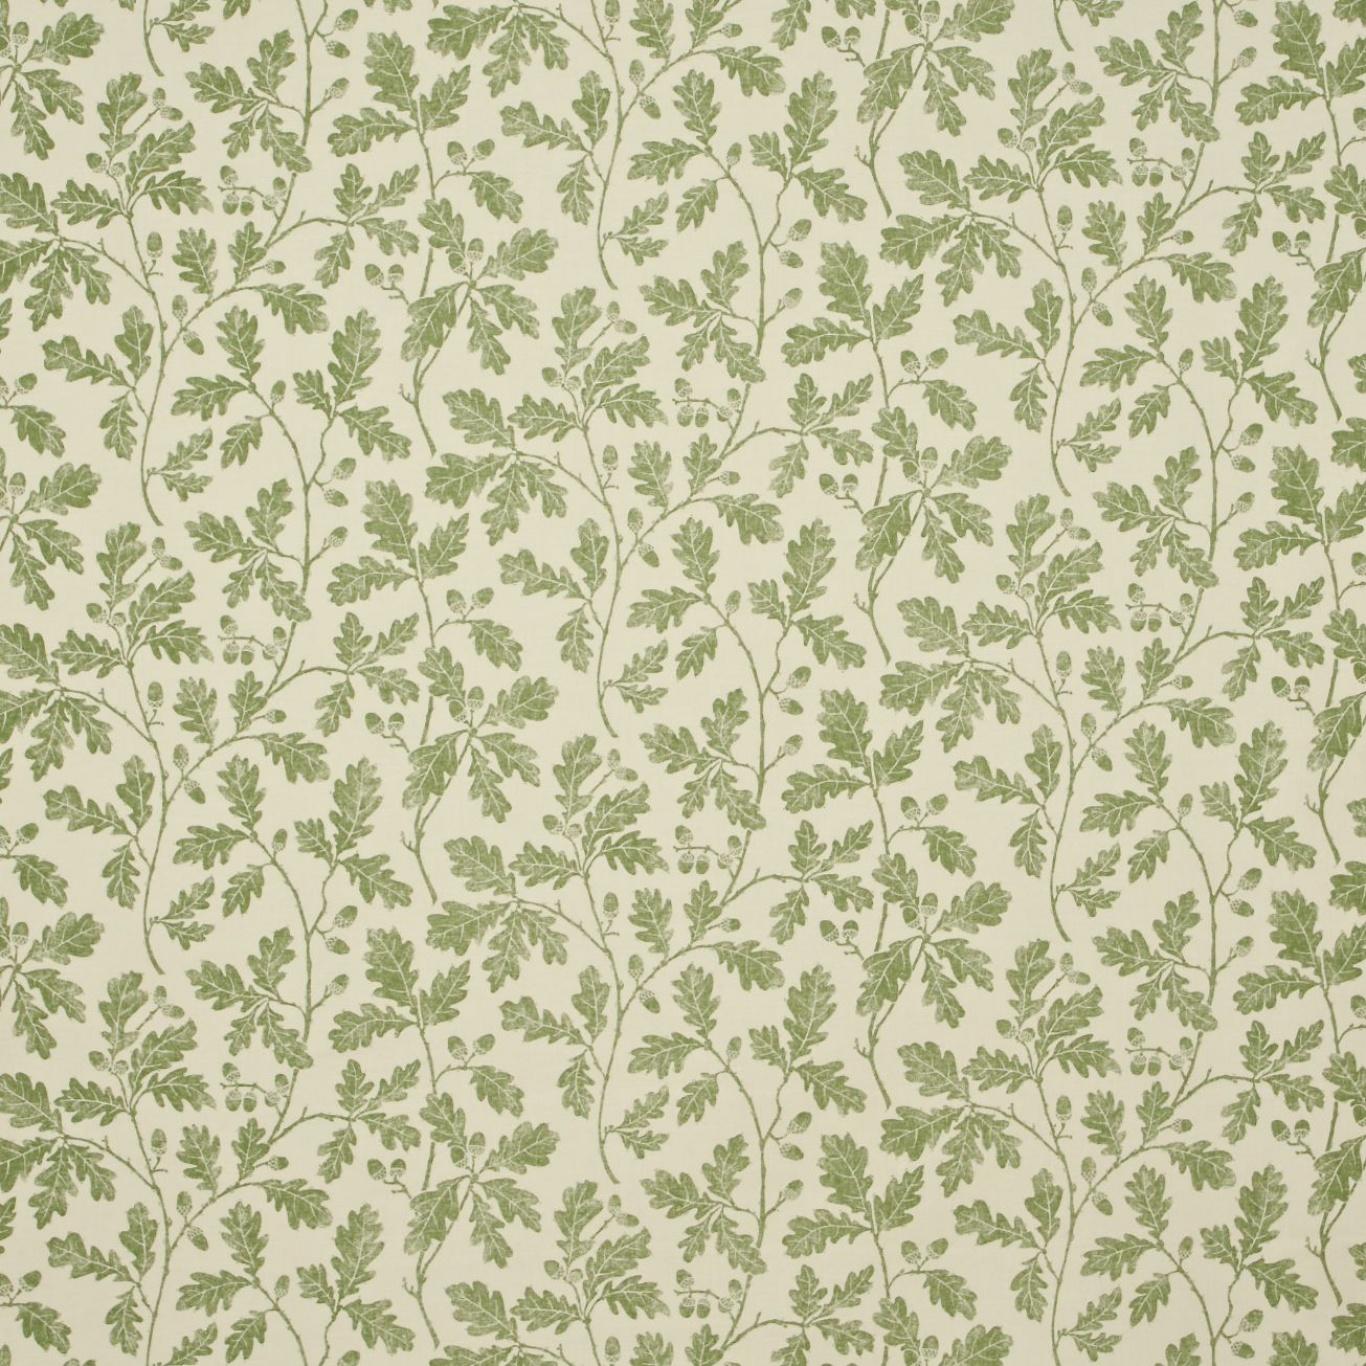 gordon smith malvern ltd sanderson oakwood green. Black Bedroom Furniture Sets. Home Design Ideas